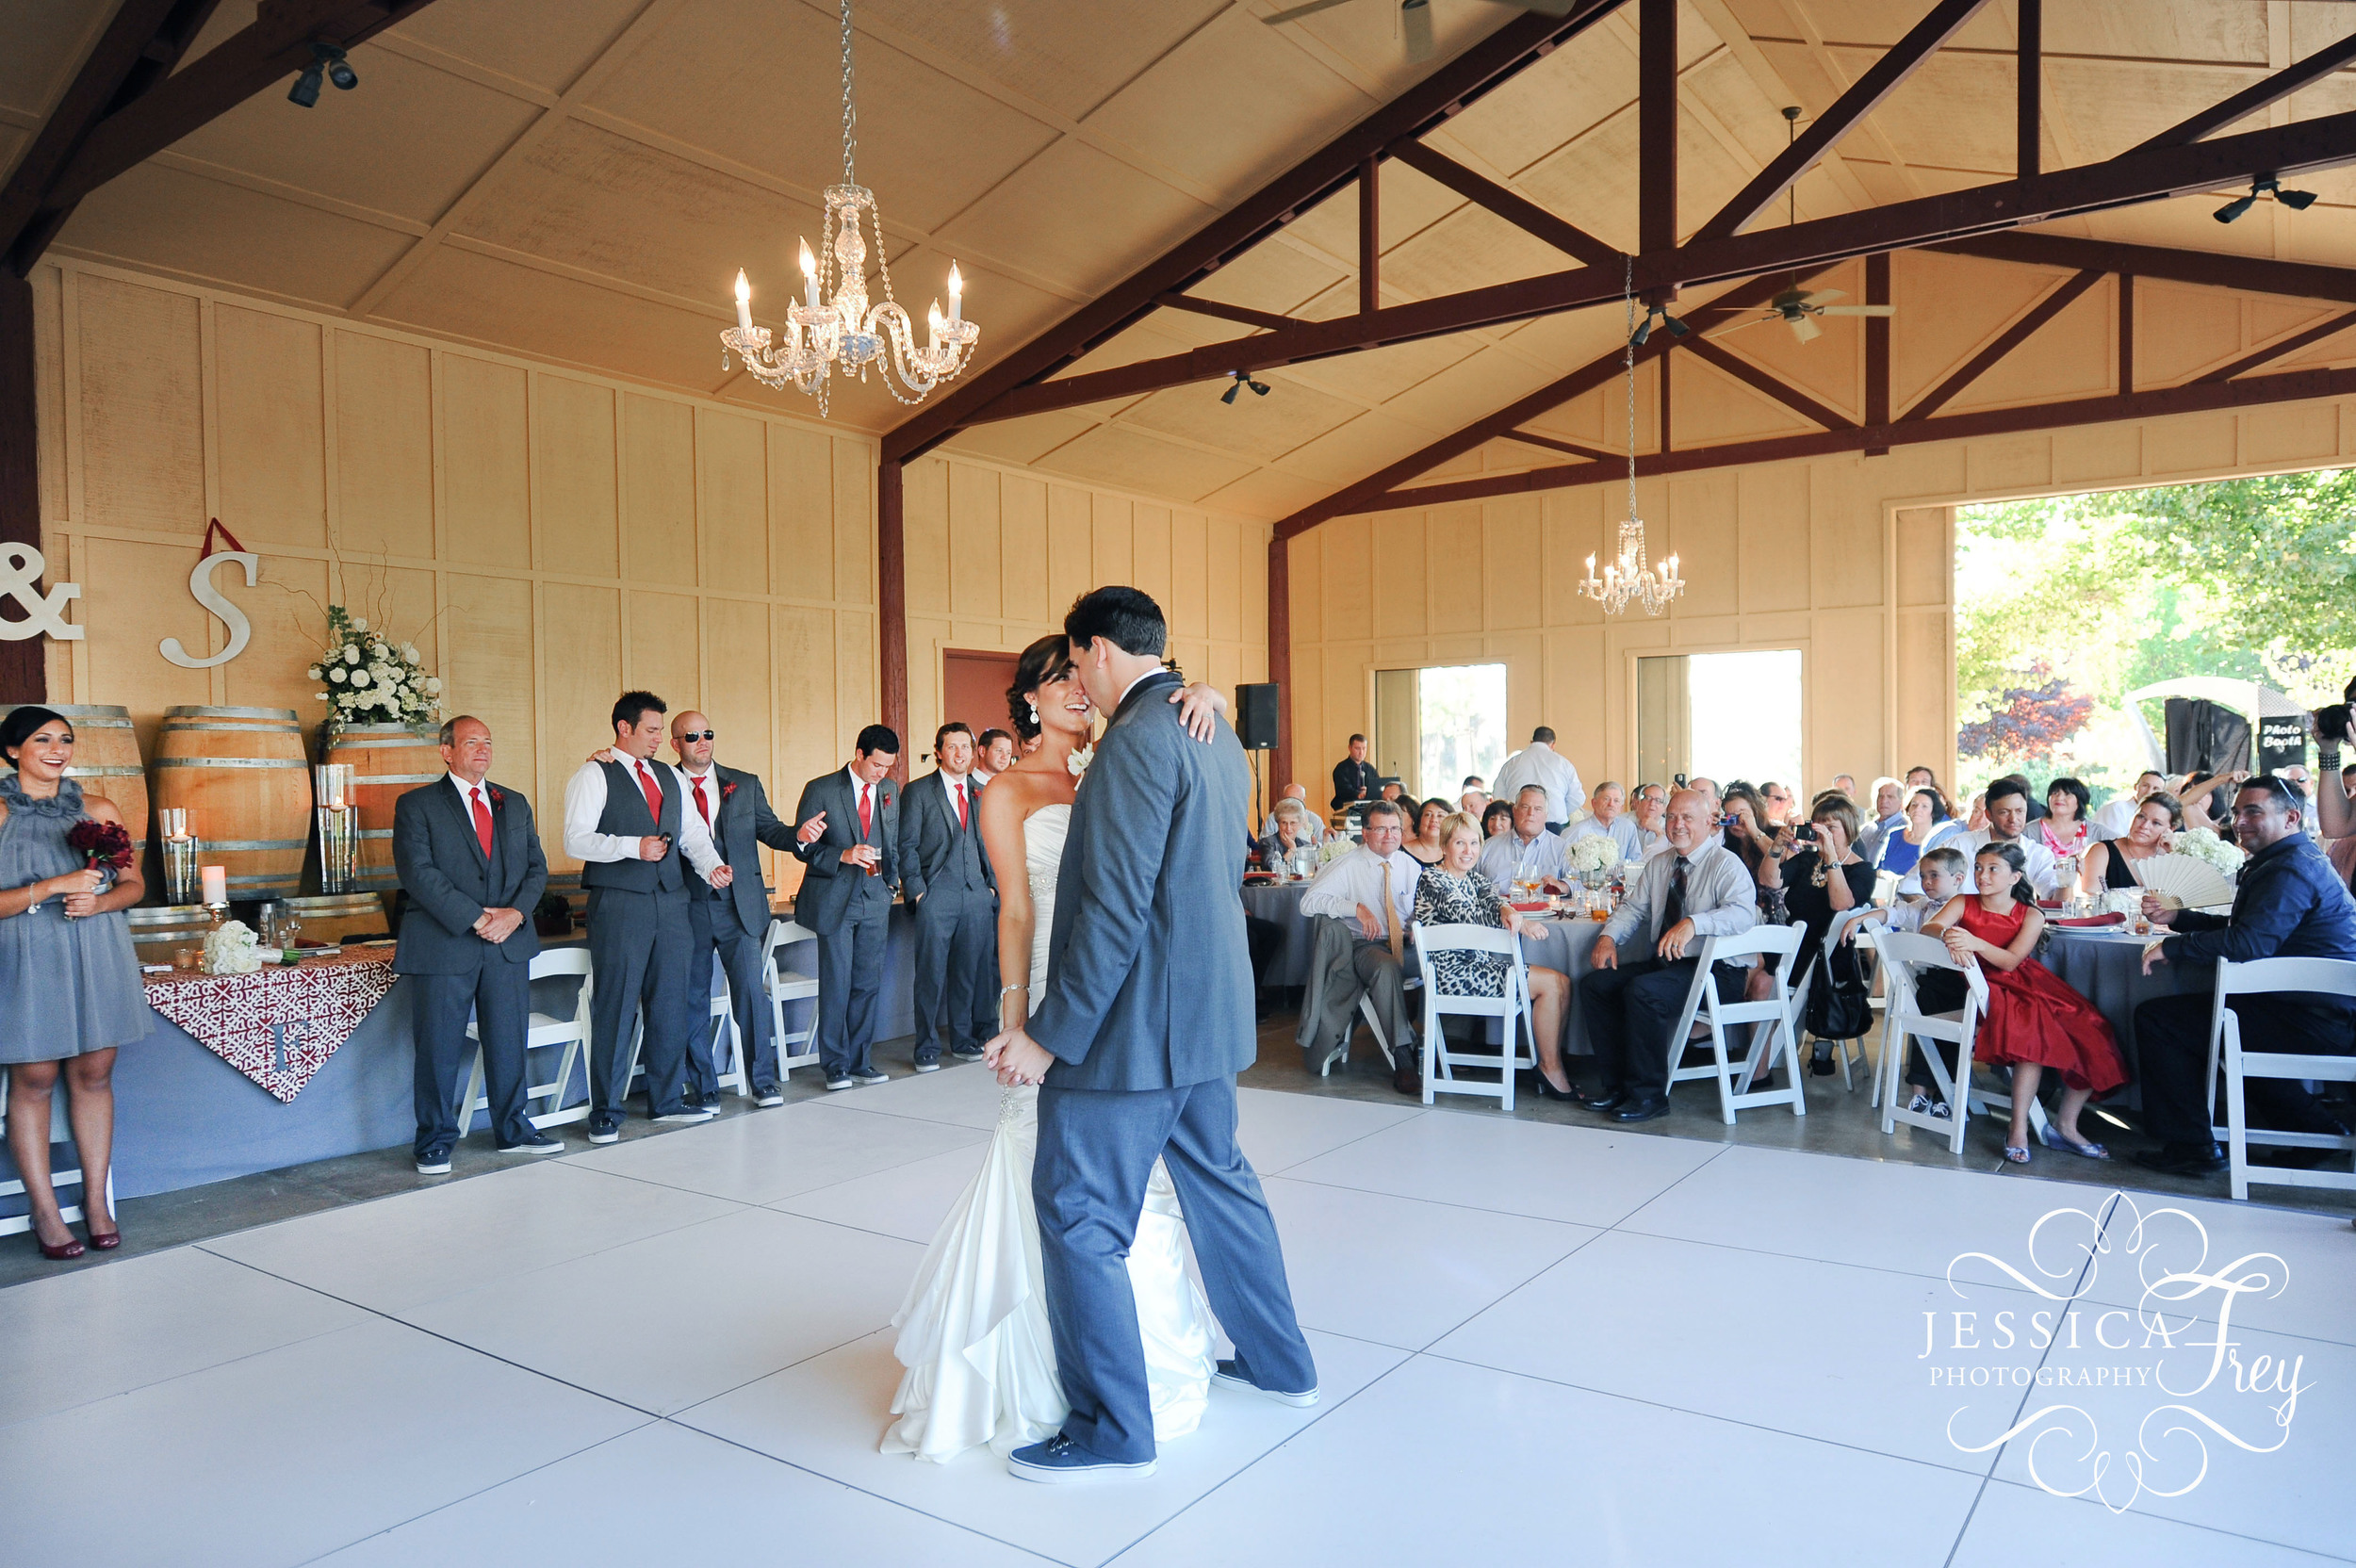 Jessica-Frey-Photography-winery-wedding-34.jpg